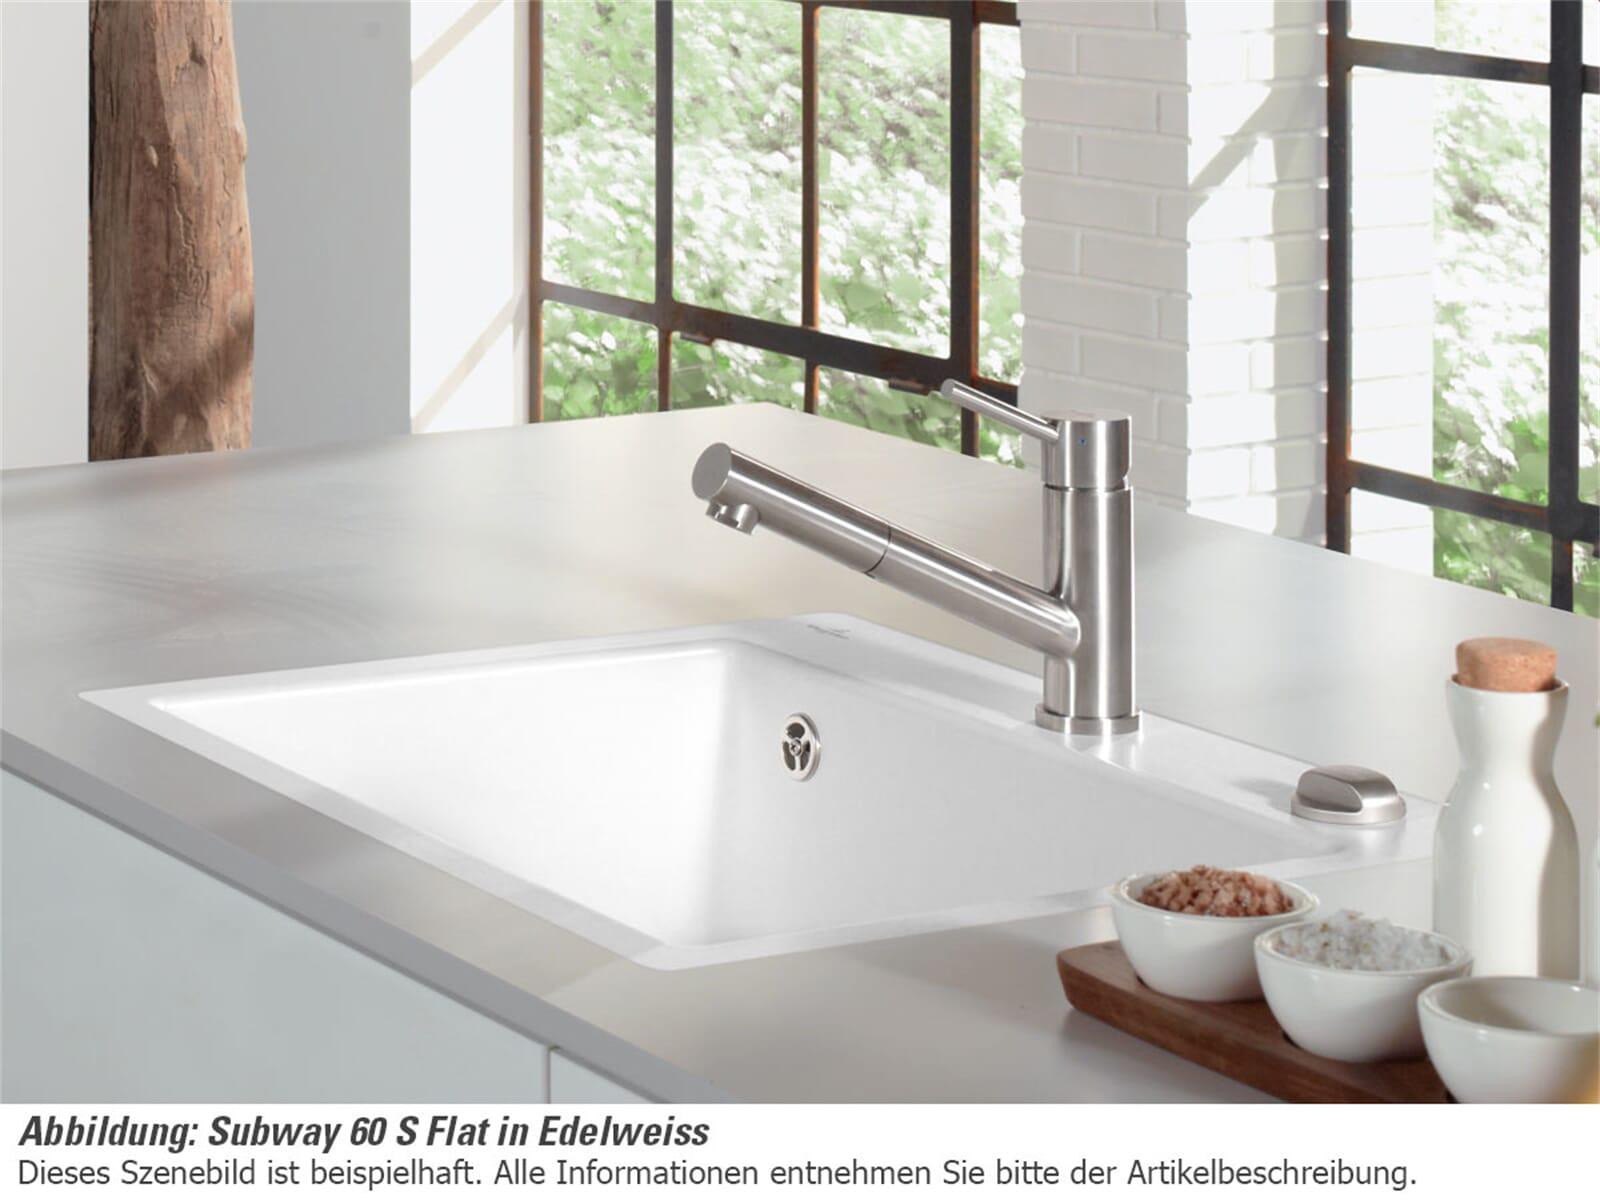 Villeroy & Boch Subway 60 S Flat Ebony - 3309 2F S5 Keramikspüle | {Spülbecken keramik villeroy & boch 81}